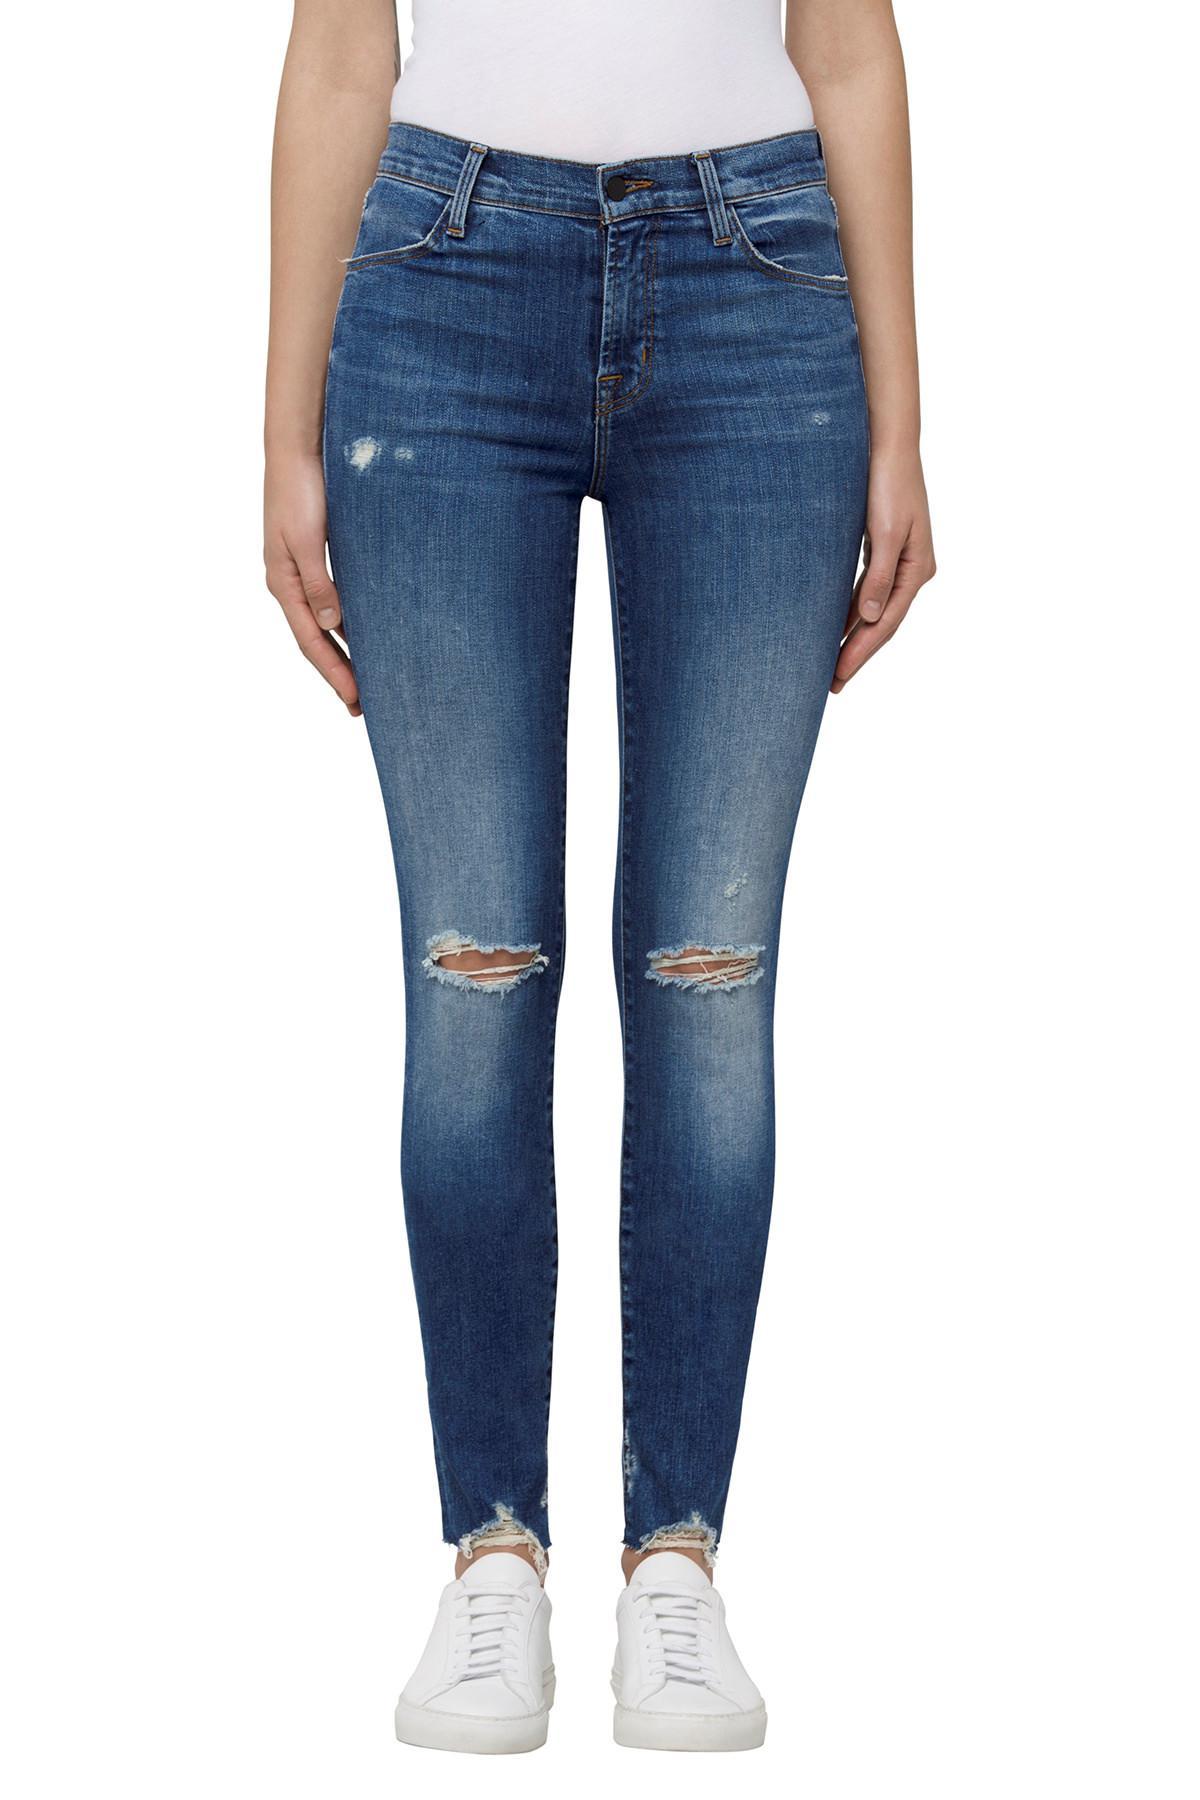 Maria High Rise Skinny Jeans With Distressed Knee And Hem - Revoke destruct blue J Brand pKvhoJ